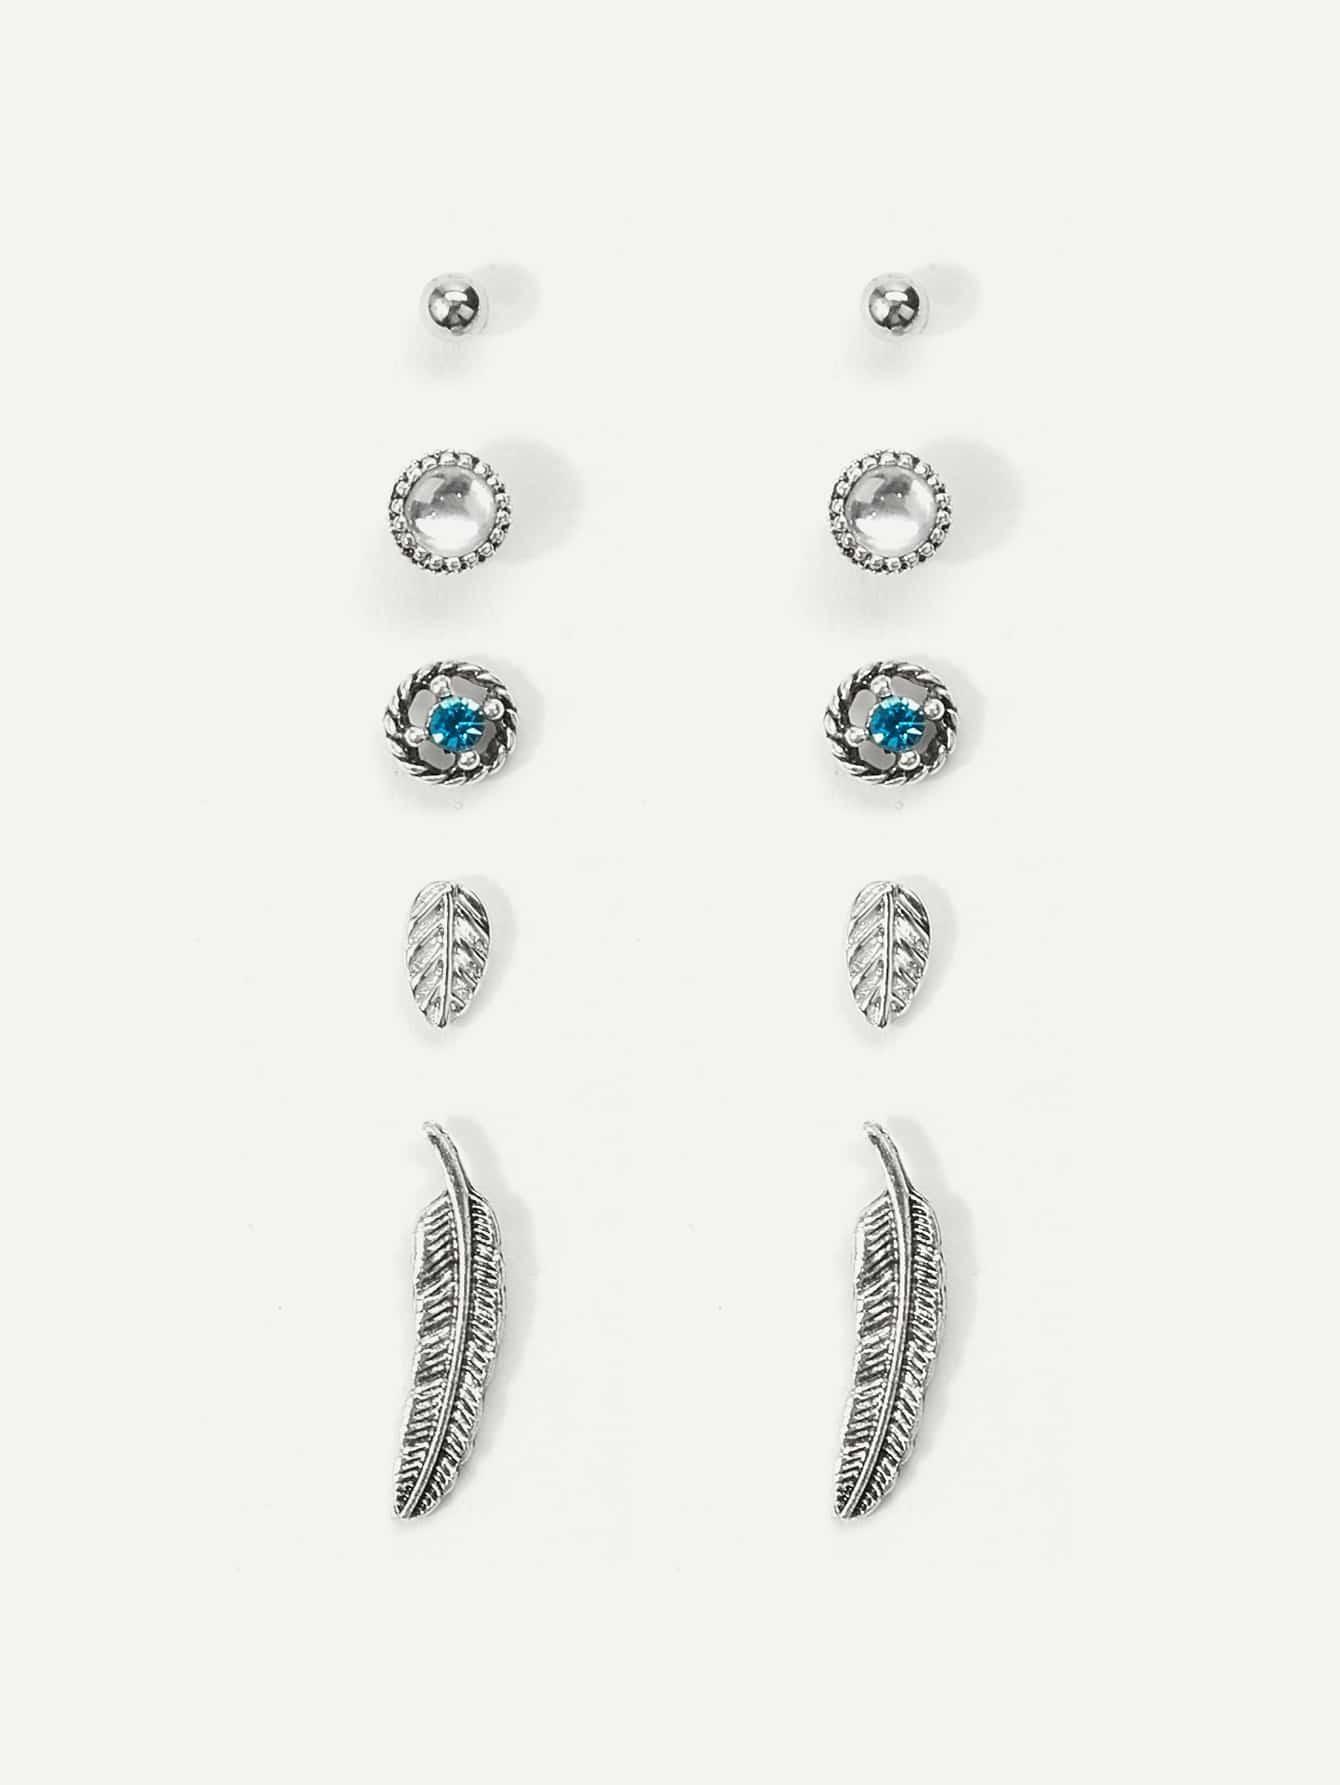 c11dae9090 Feather & Leaf Detail Stud Earrings 5pairs